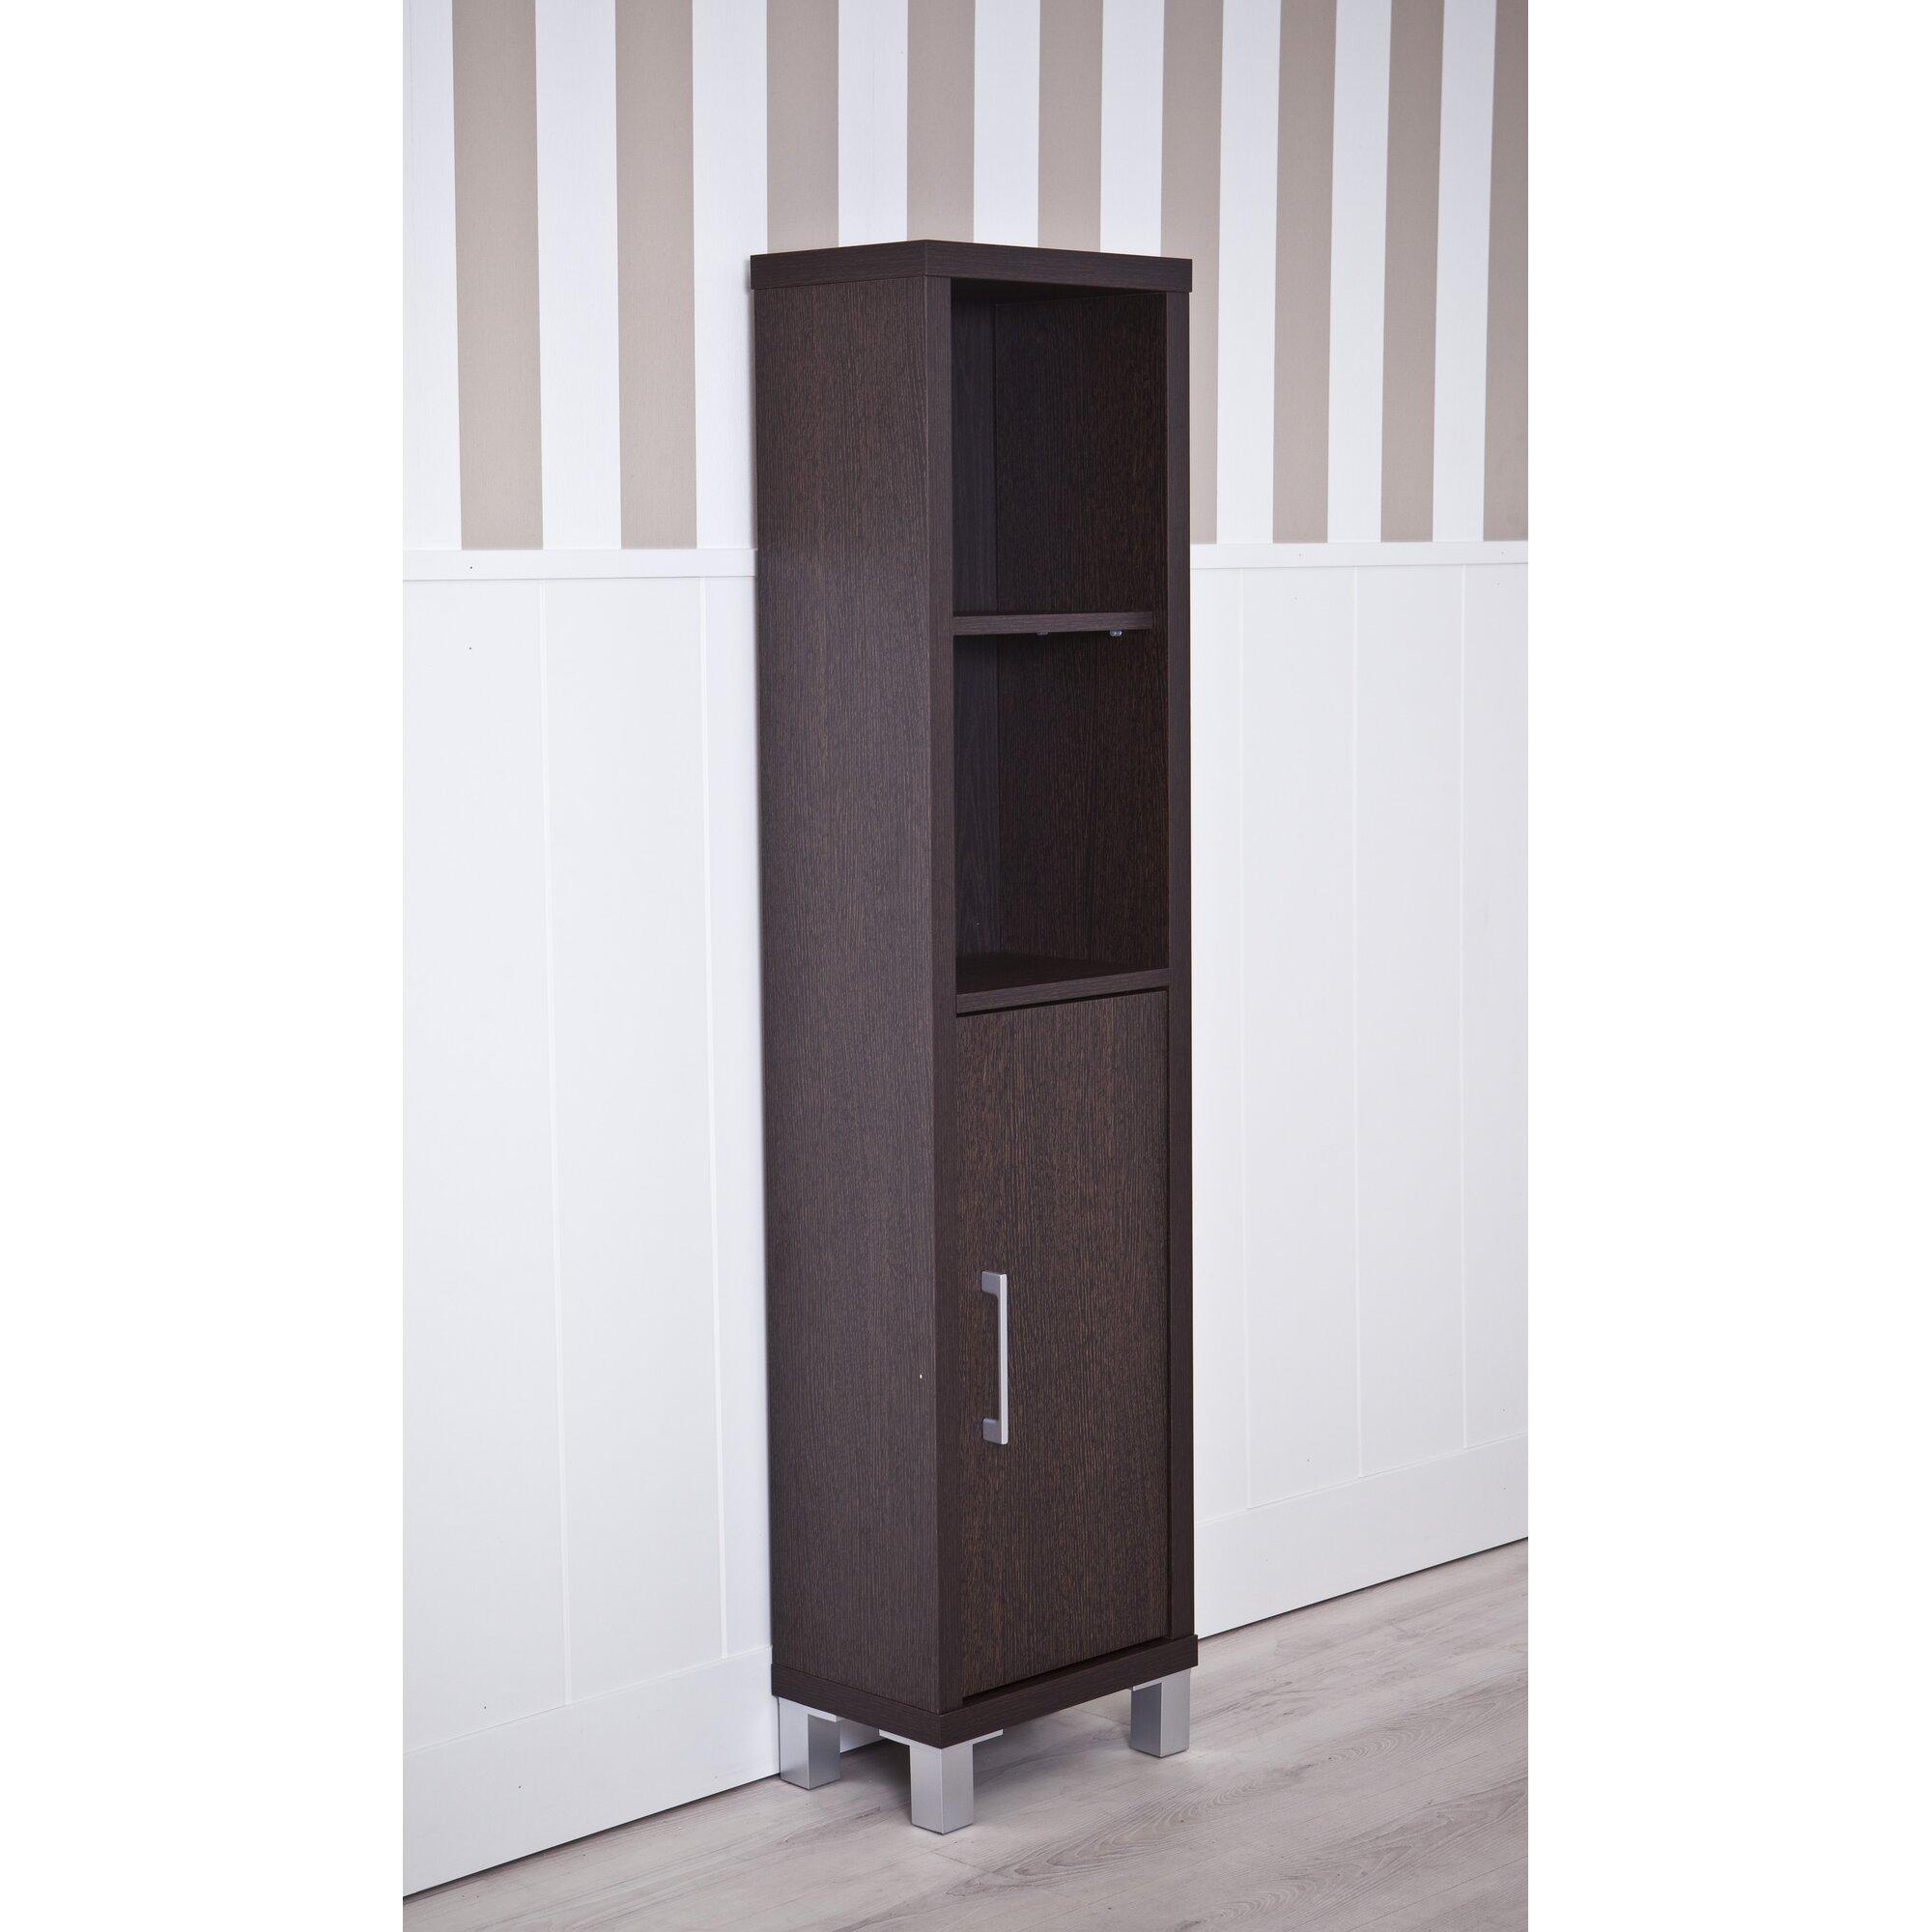 Galveston+34+x+141cm+Freestanding+Cabinet